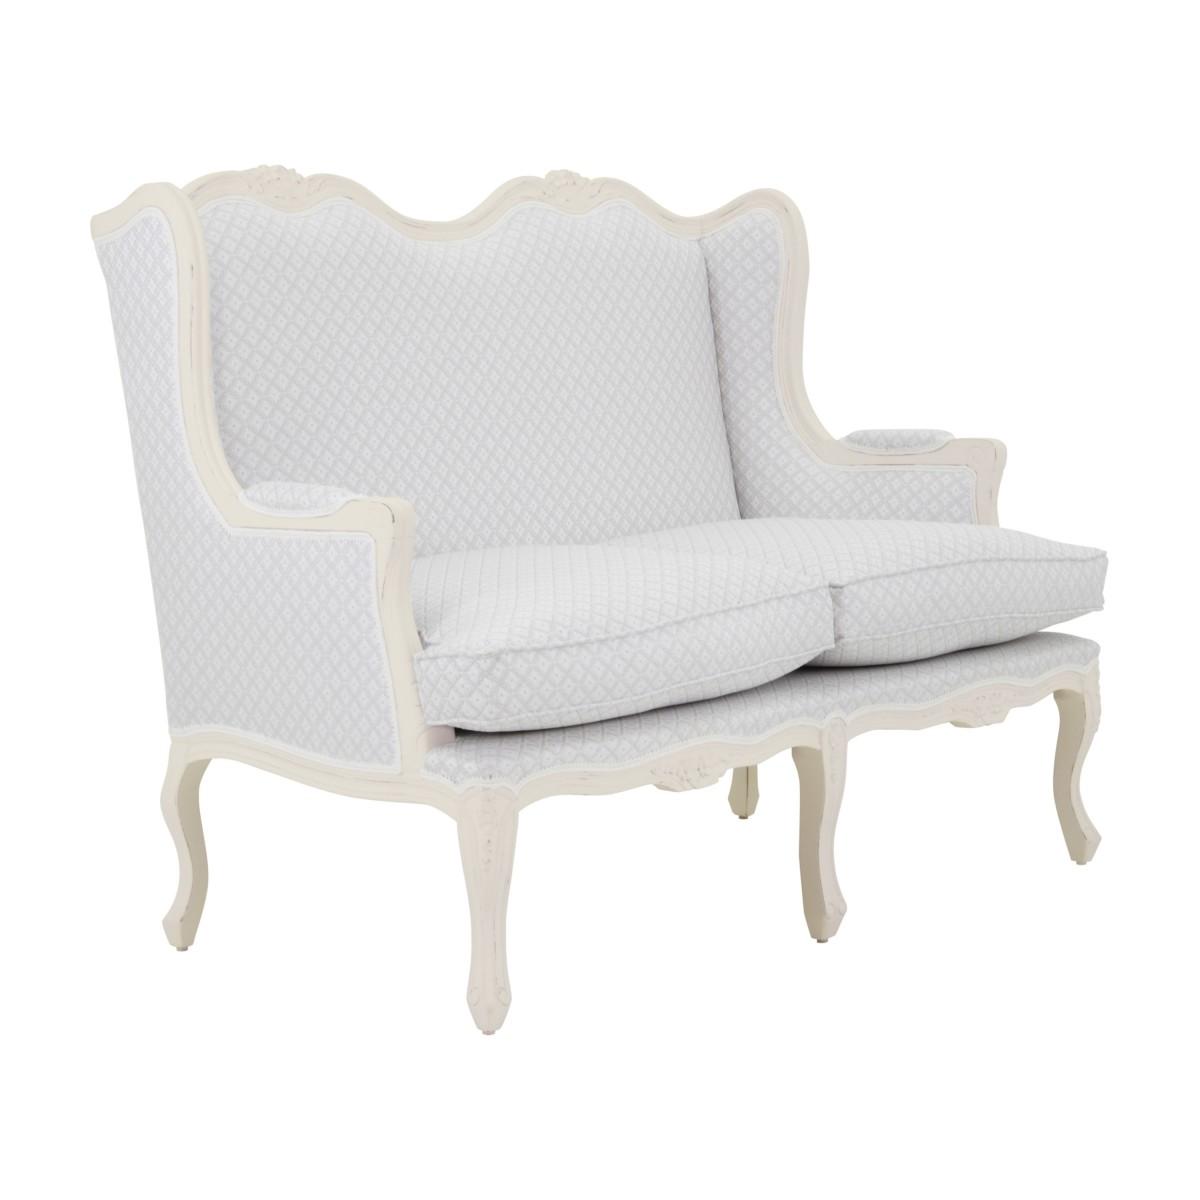 2 Seater sofa Enea - Sevensedie